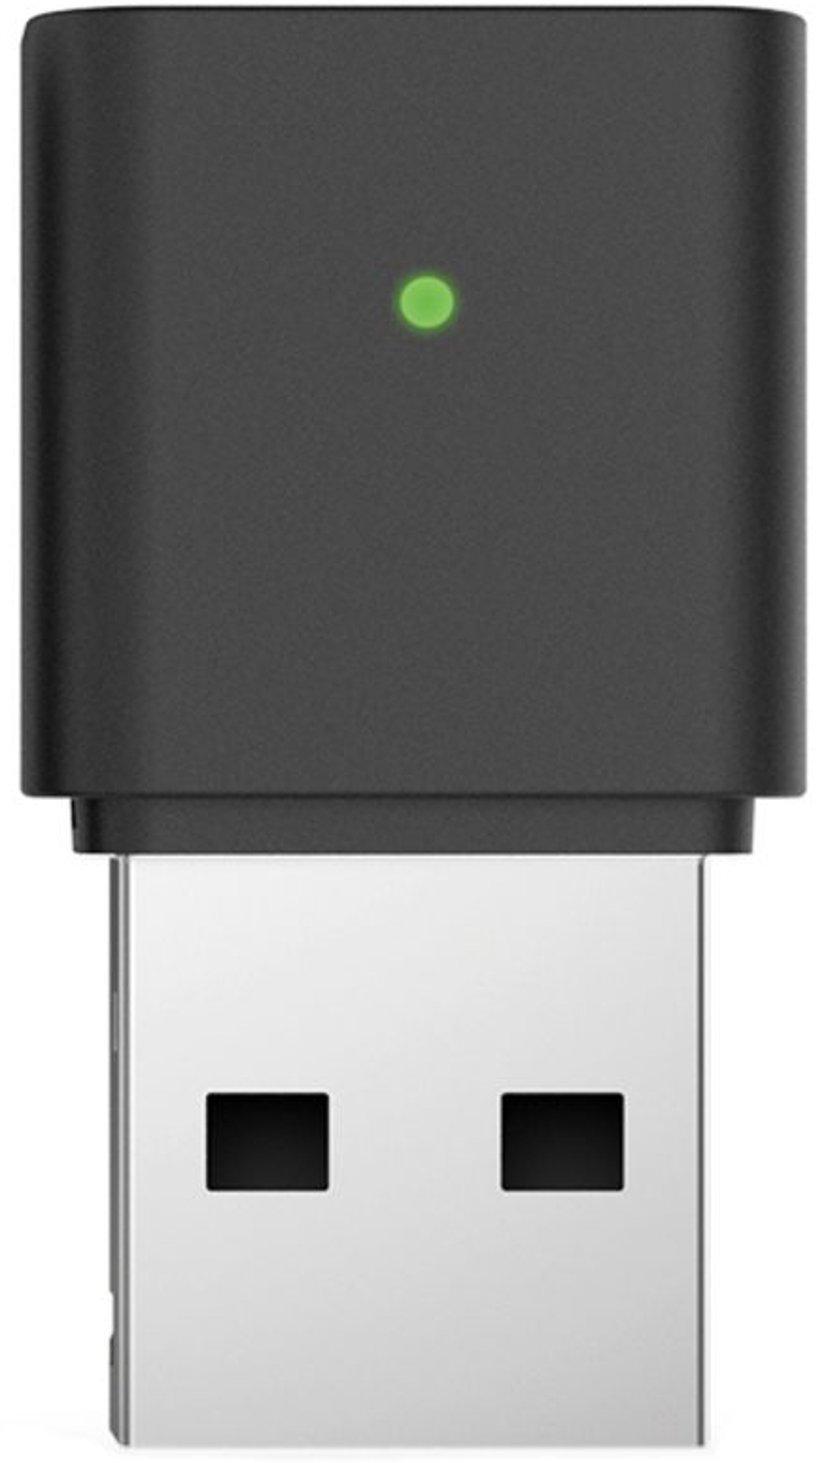 D-Link DWA-131 USB WiFi Nano Adapter